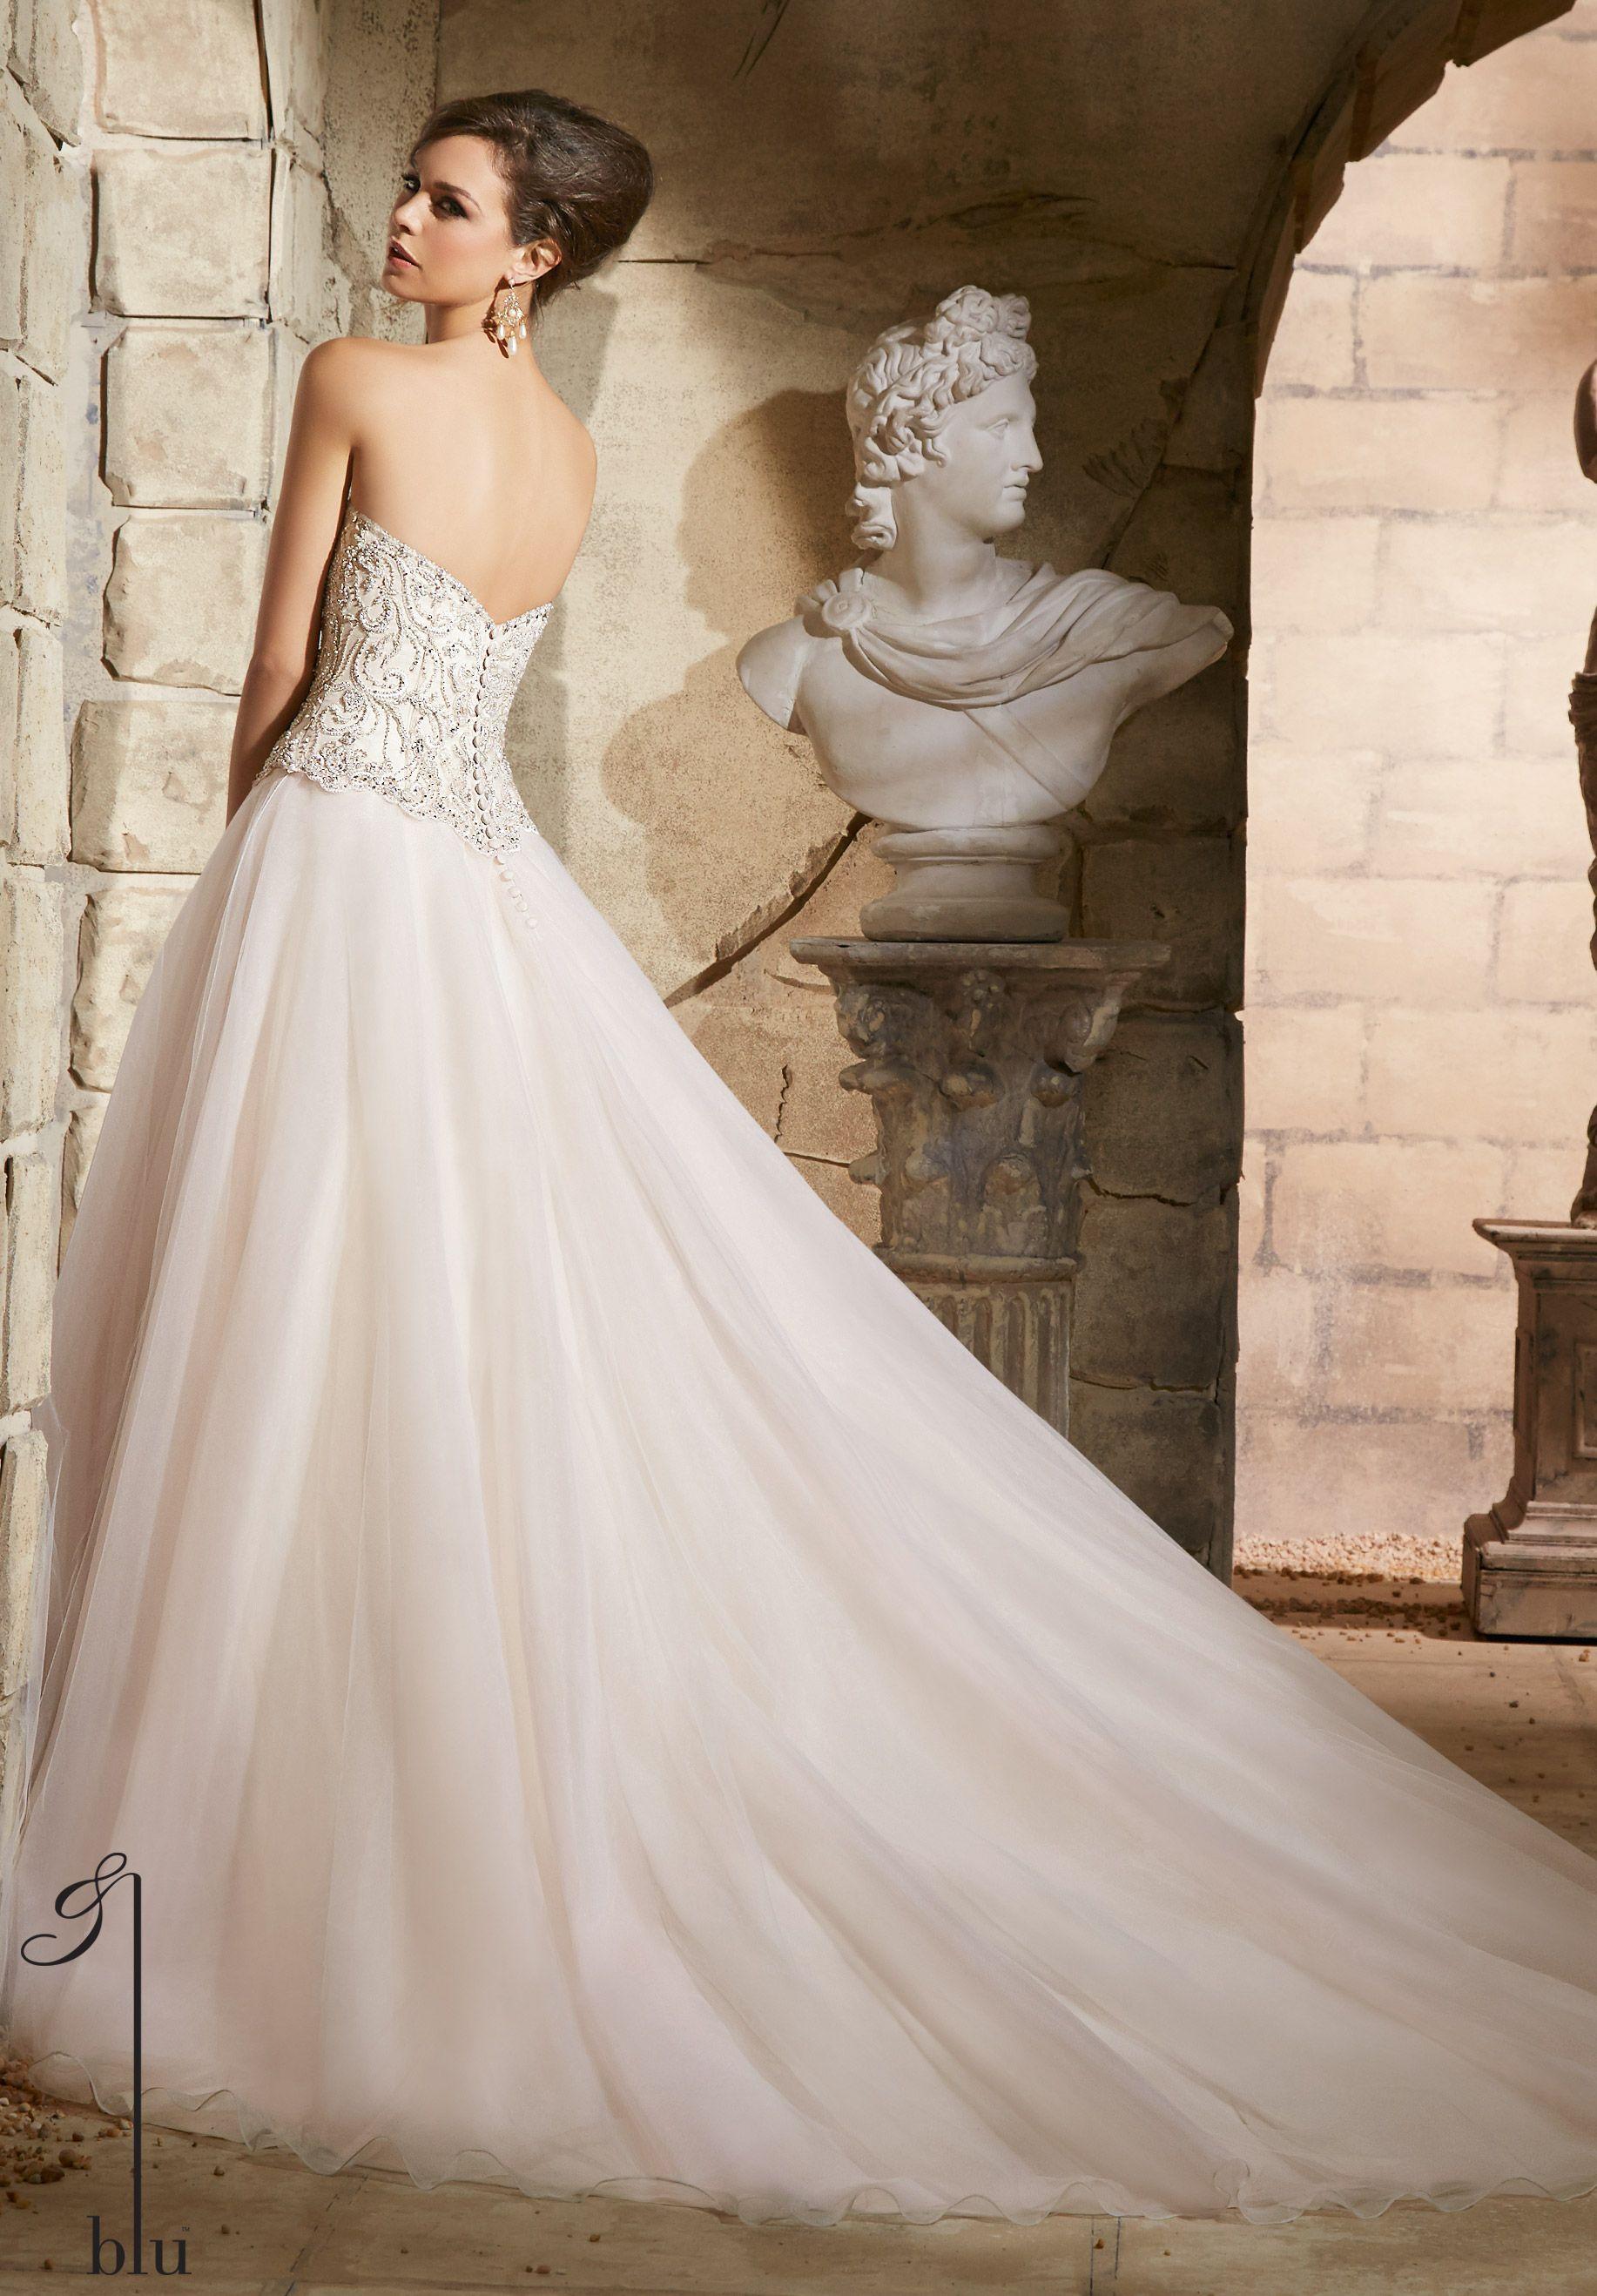 Wedding bridal gowns designer blu dress style 5373